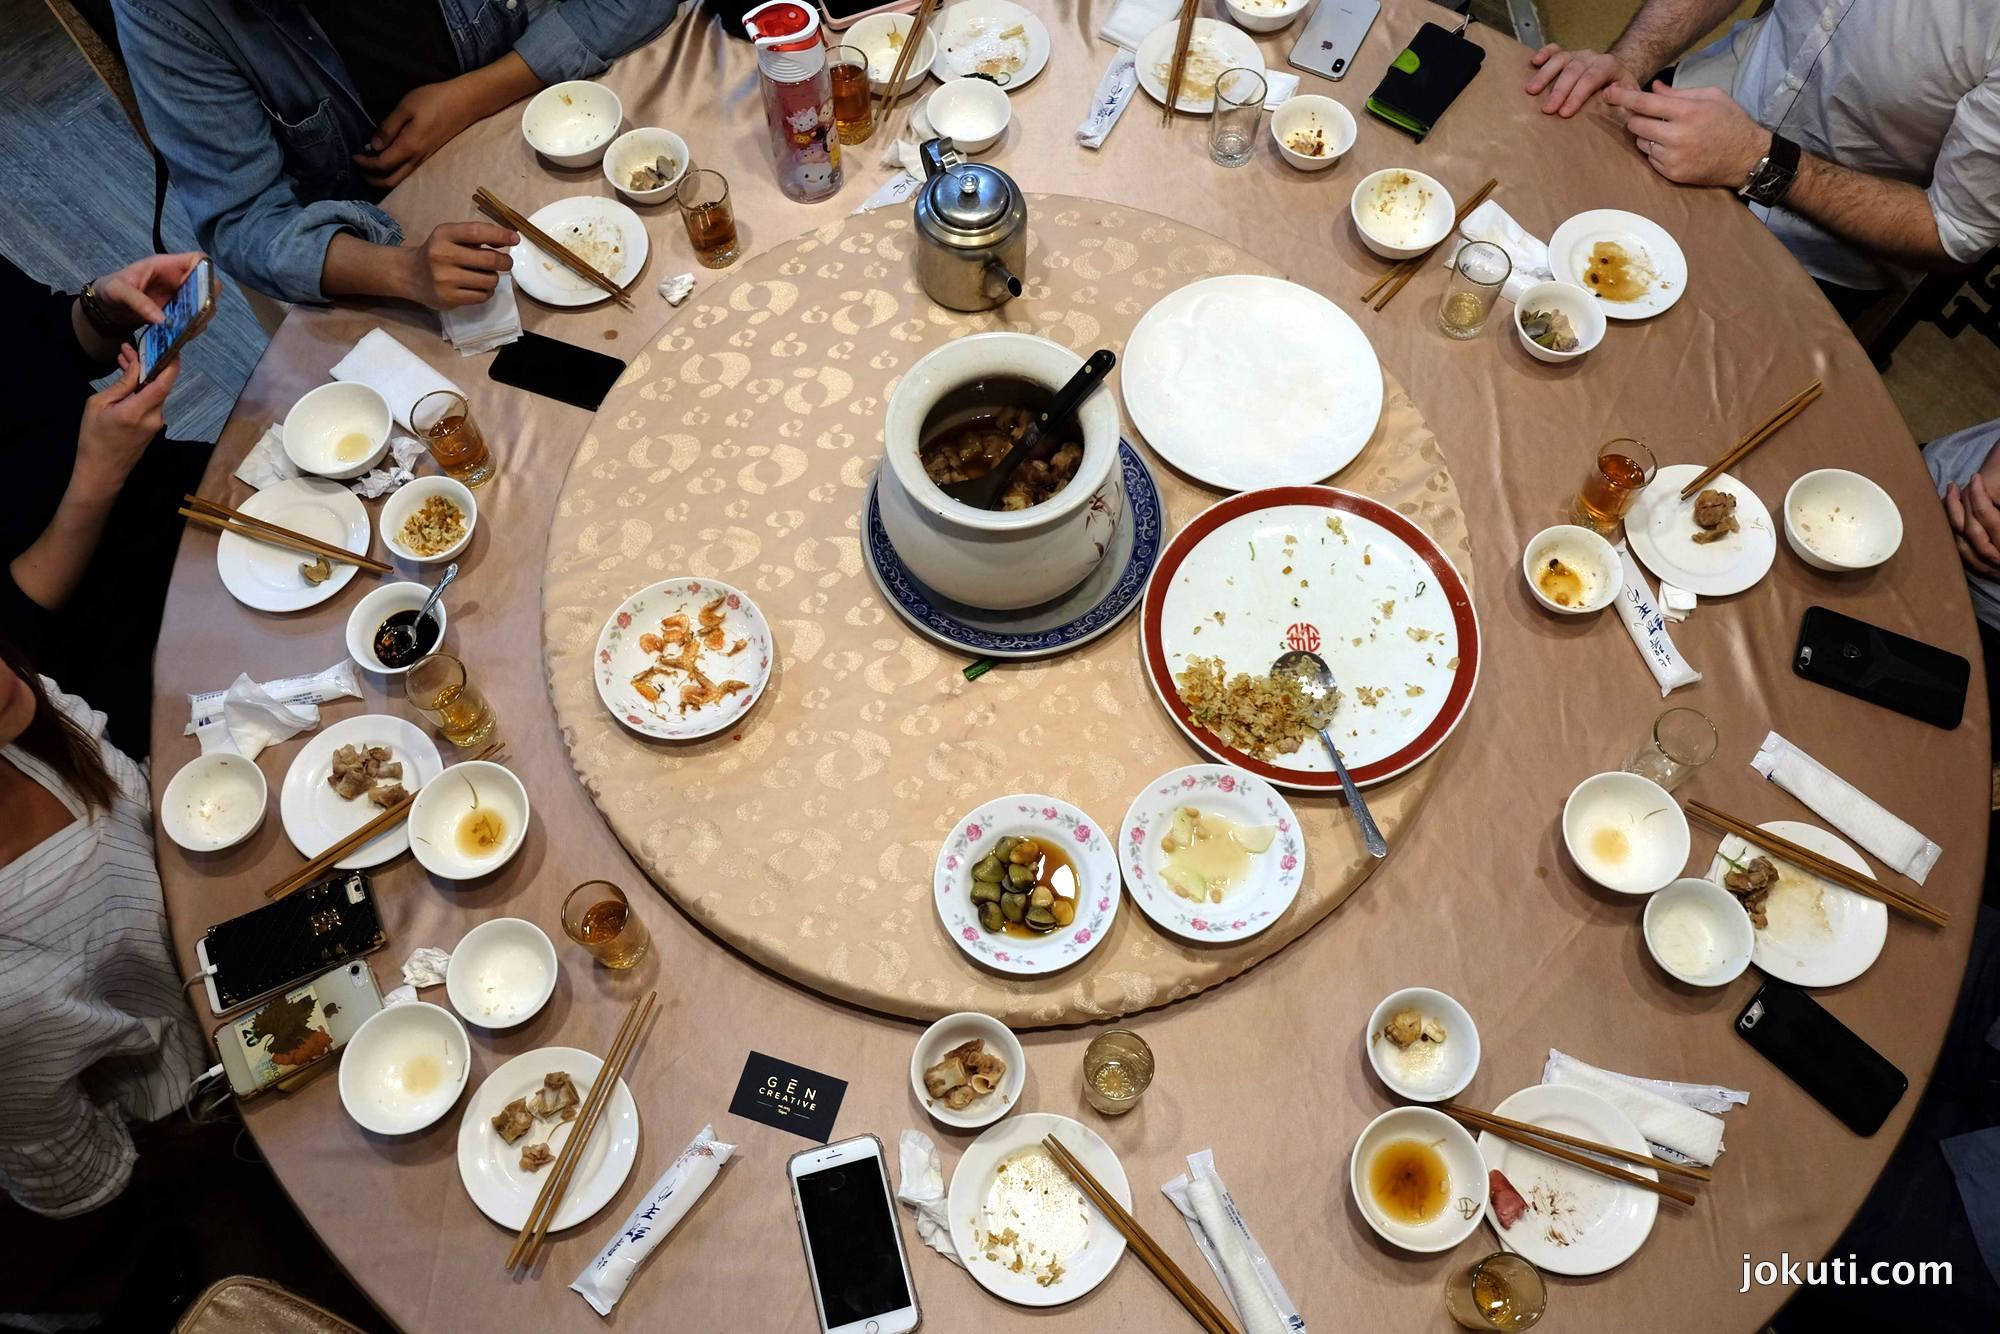 dscf3002_taipei_ming_fu_seafood_michelin_taiwan_vilagevo_jokuti.jpg